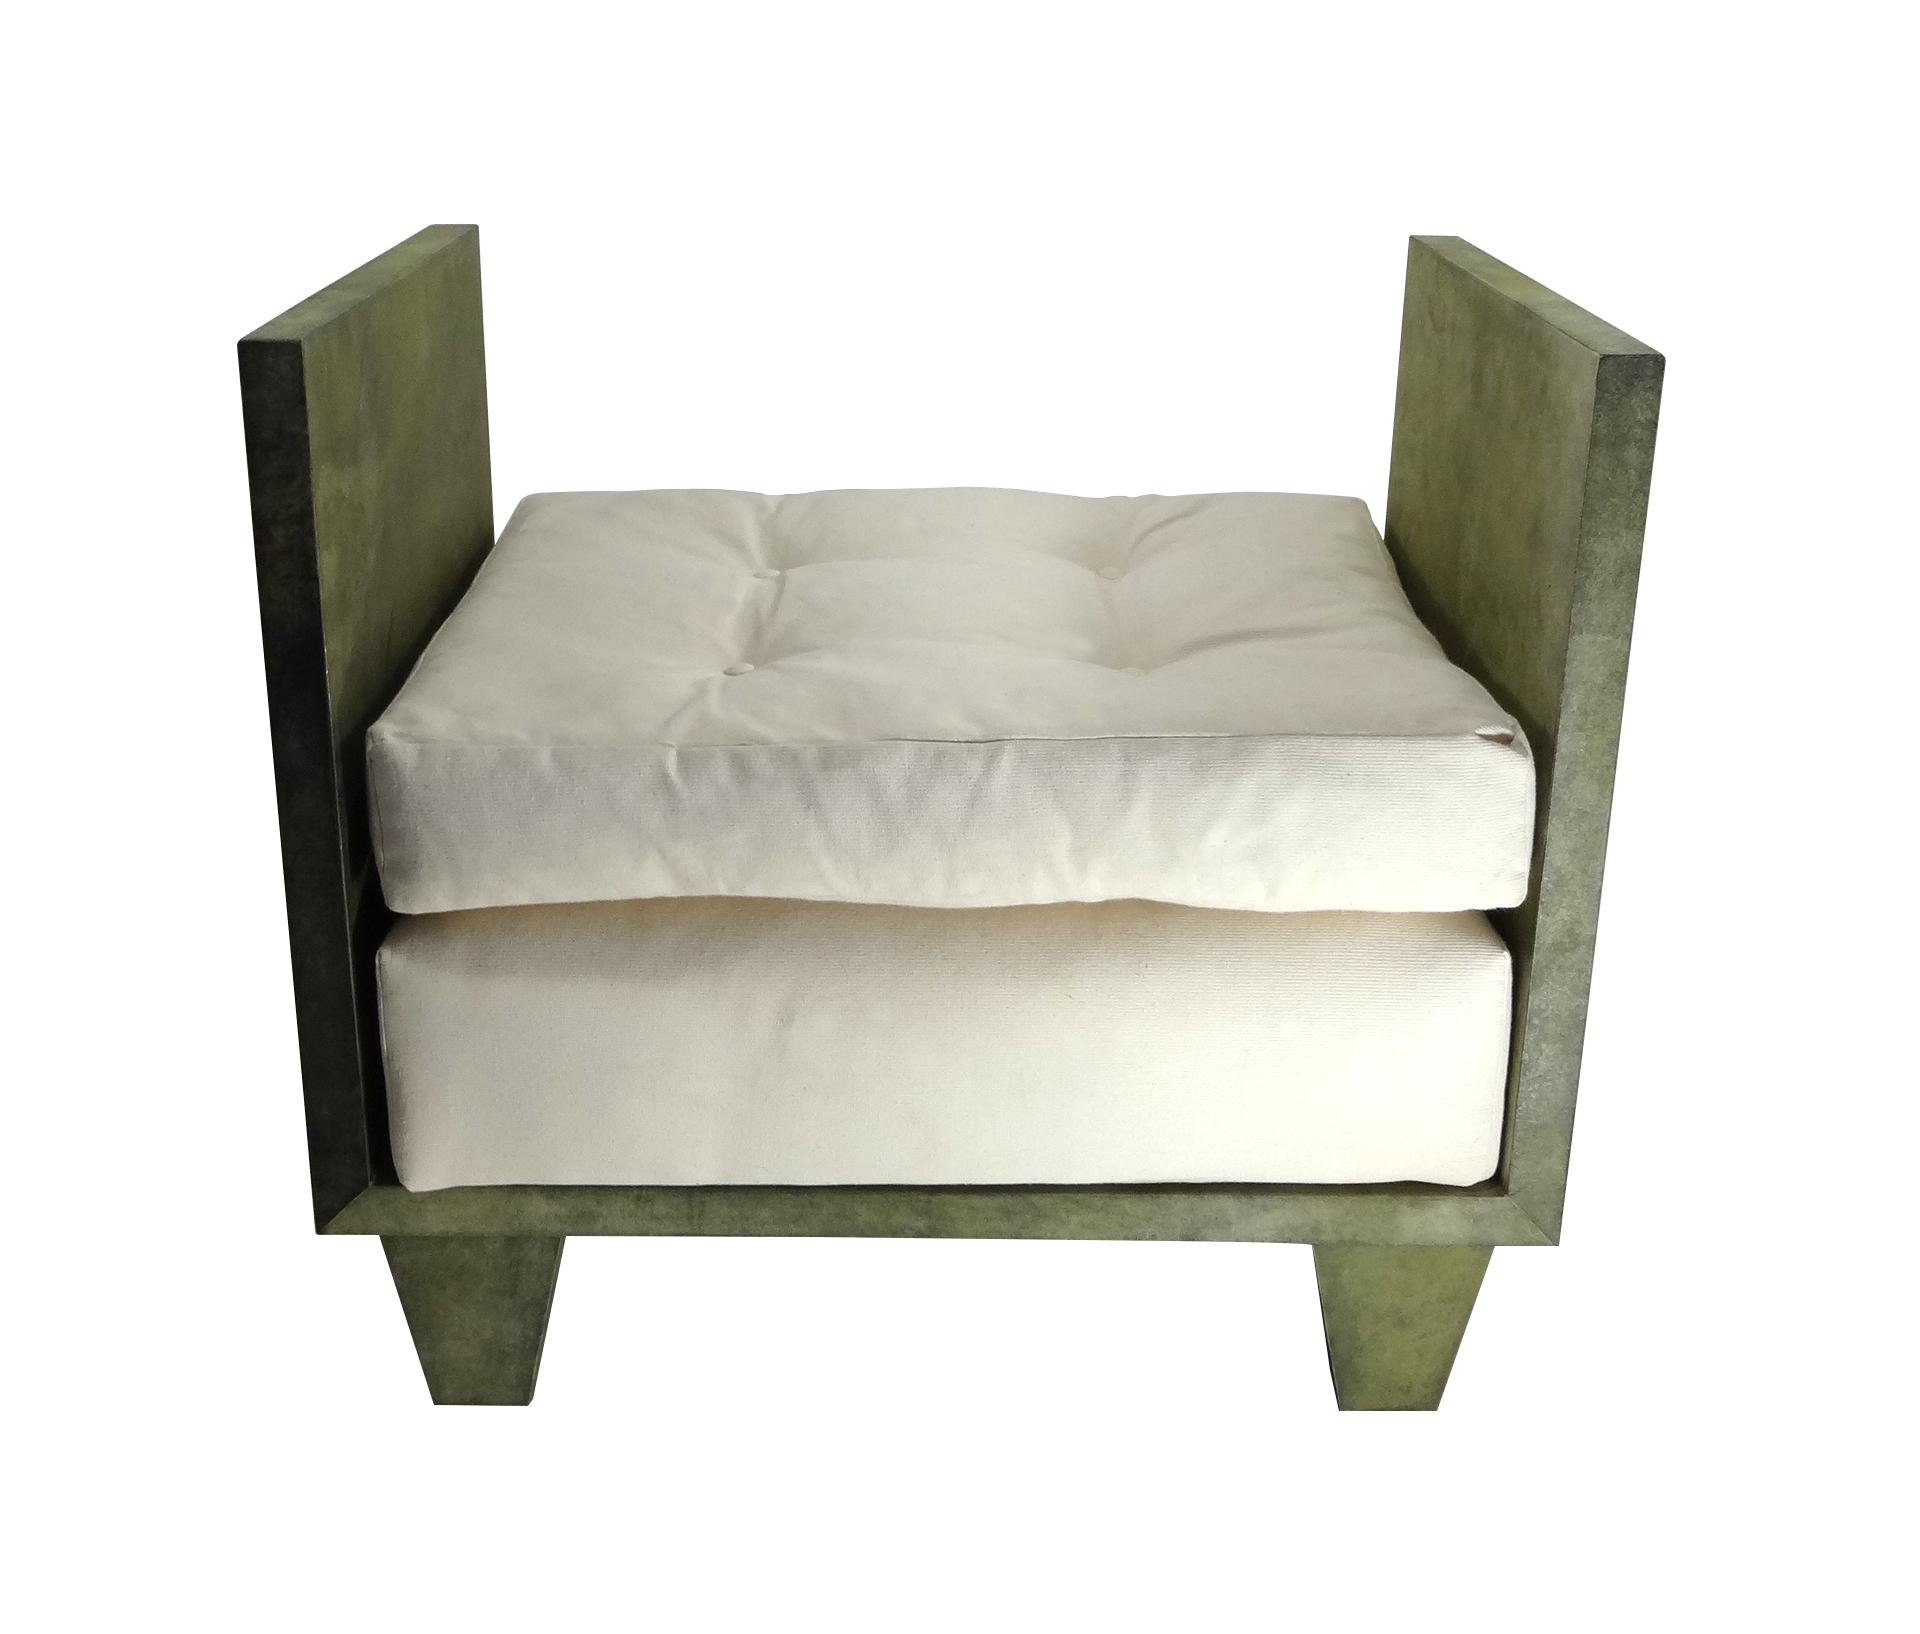 Green JMF Style Bench